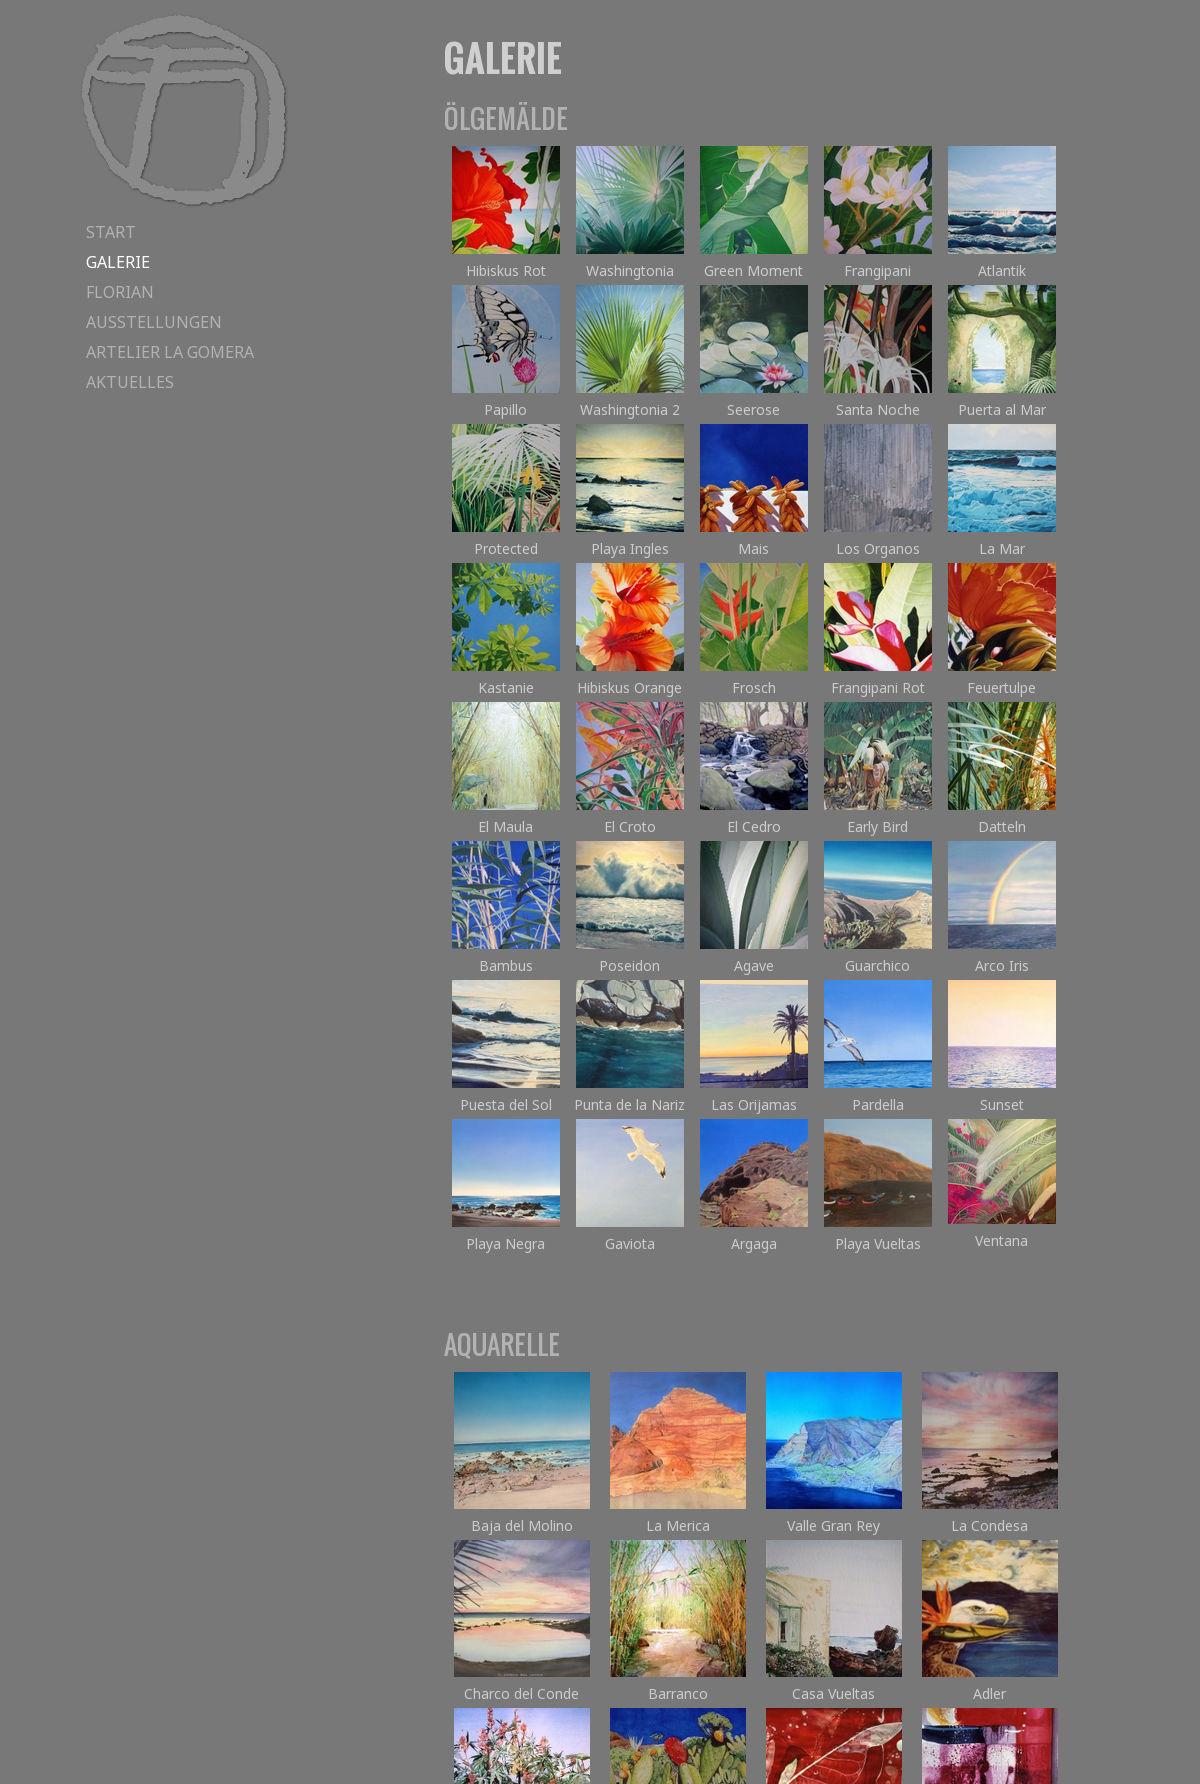 Galerie-Webseite, Florian Schuster-Böckler